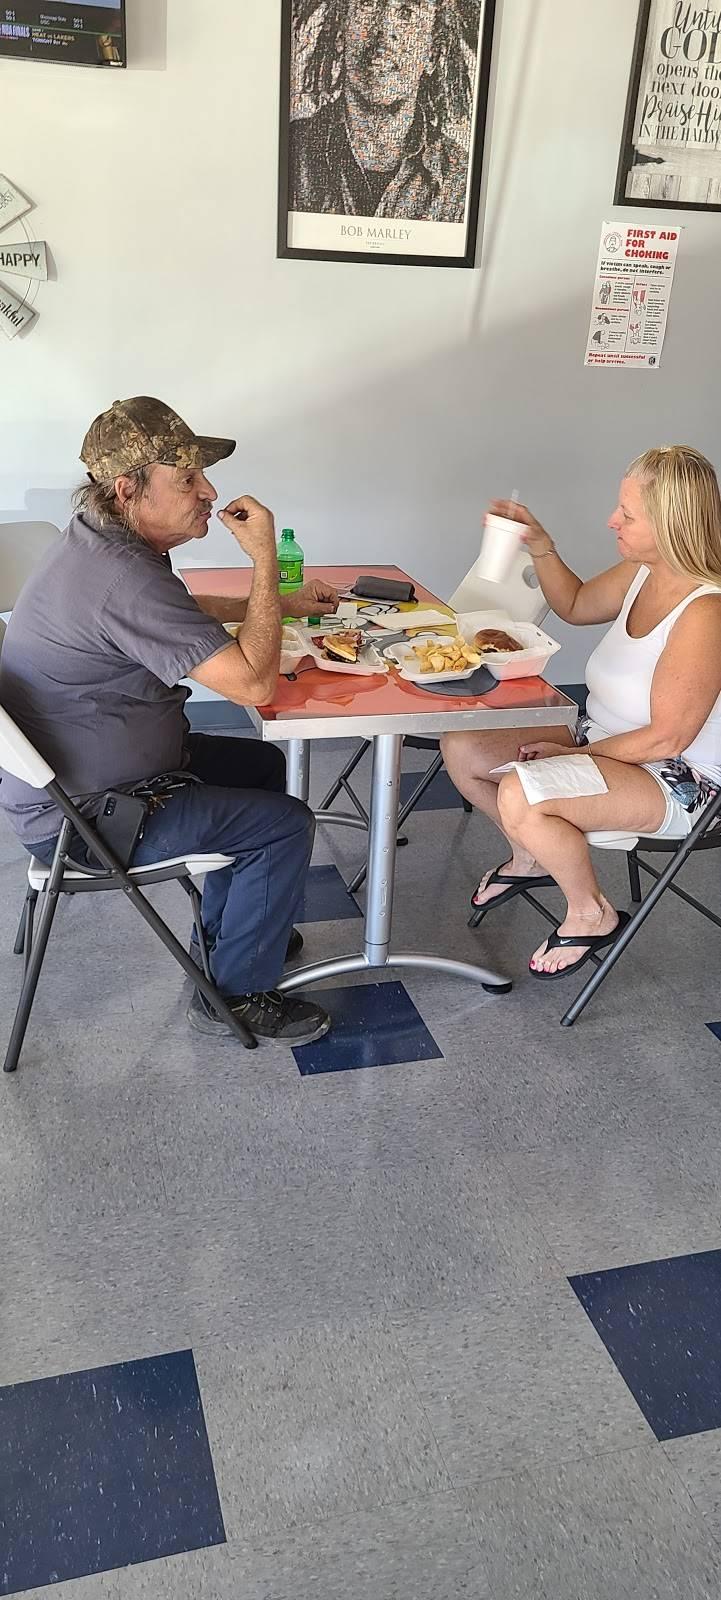 Bs Kitchen | restaurant | 226 Greenville St S F, Newnan, GA 30263, USA | 6785529999 OR +1 678-552-9999